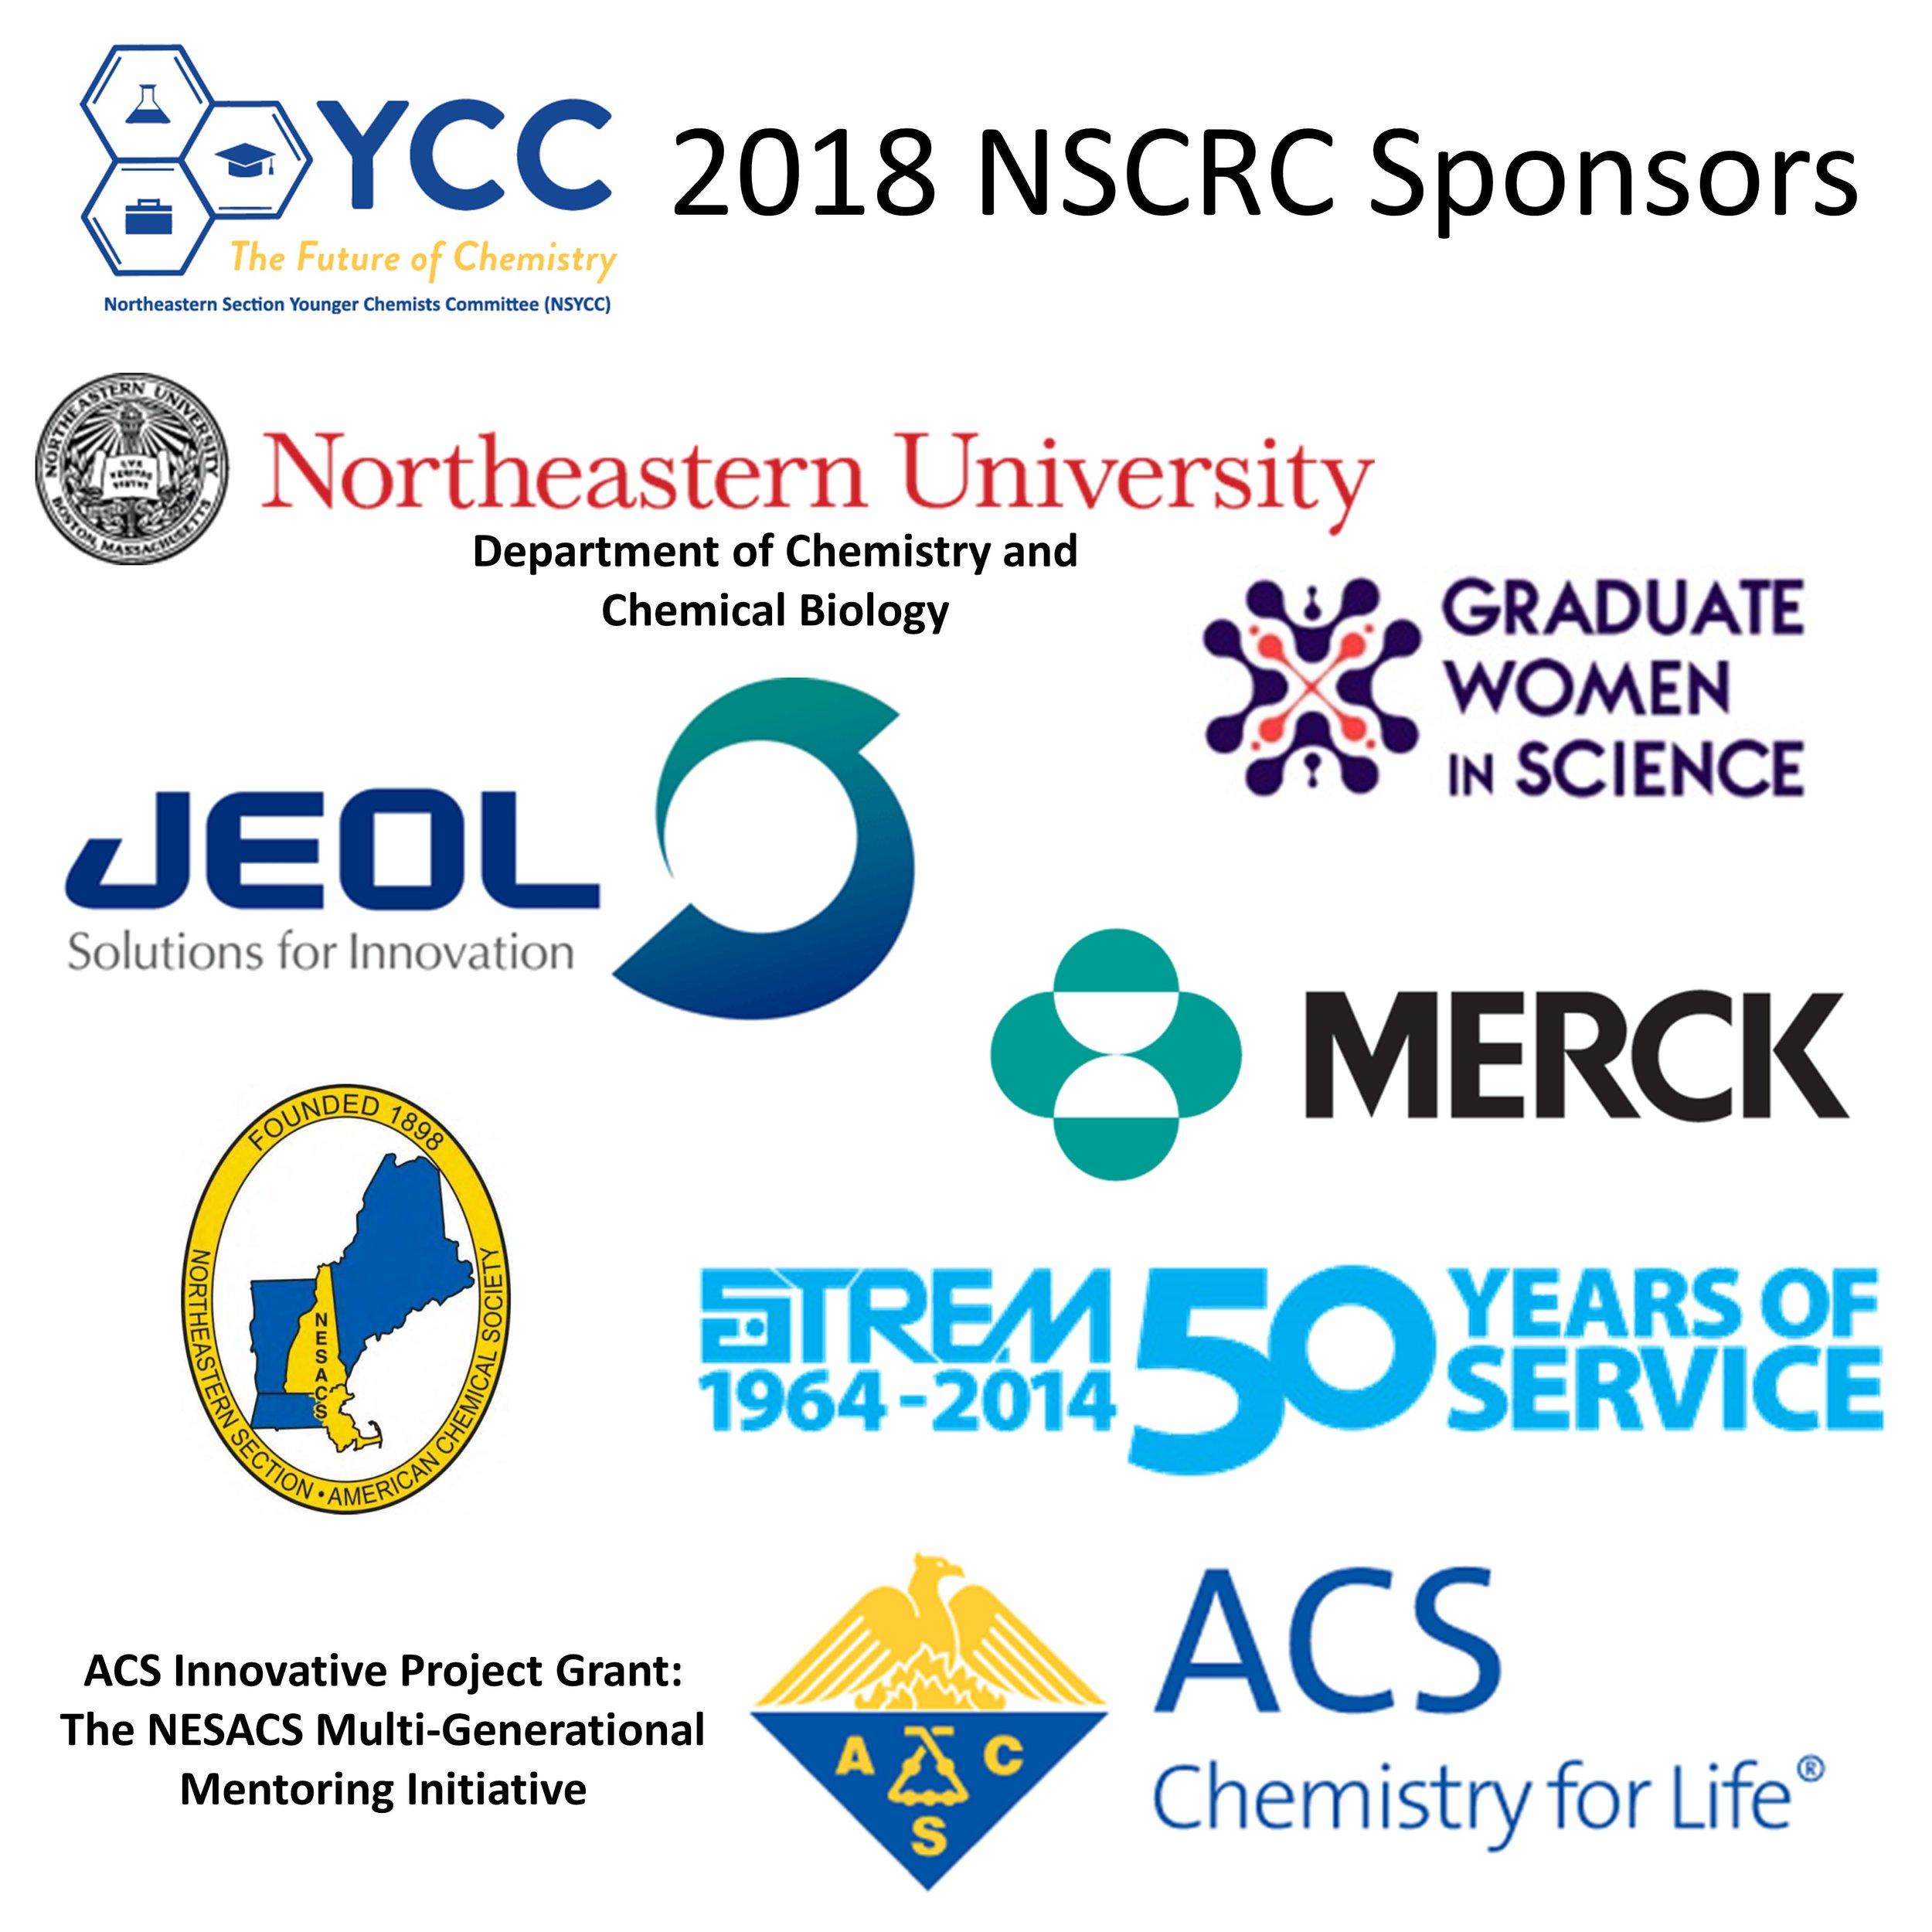 2018 NSCRC Sponsors.jpg